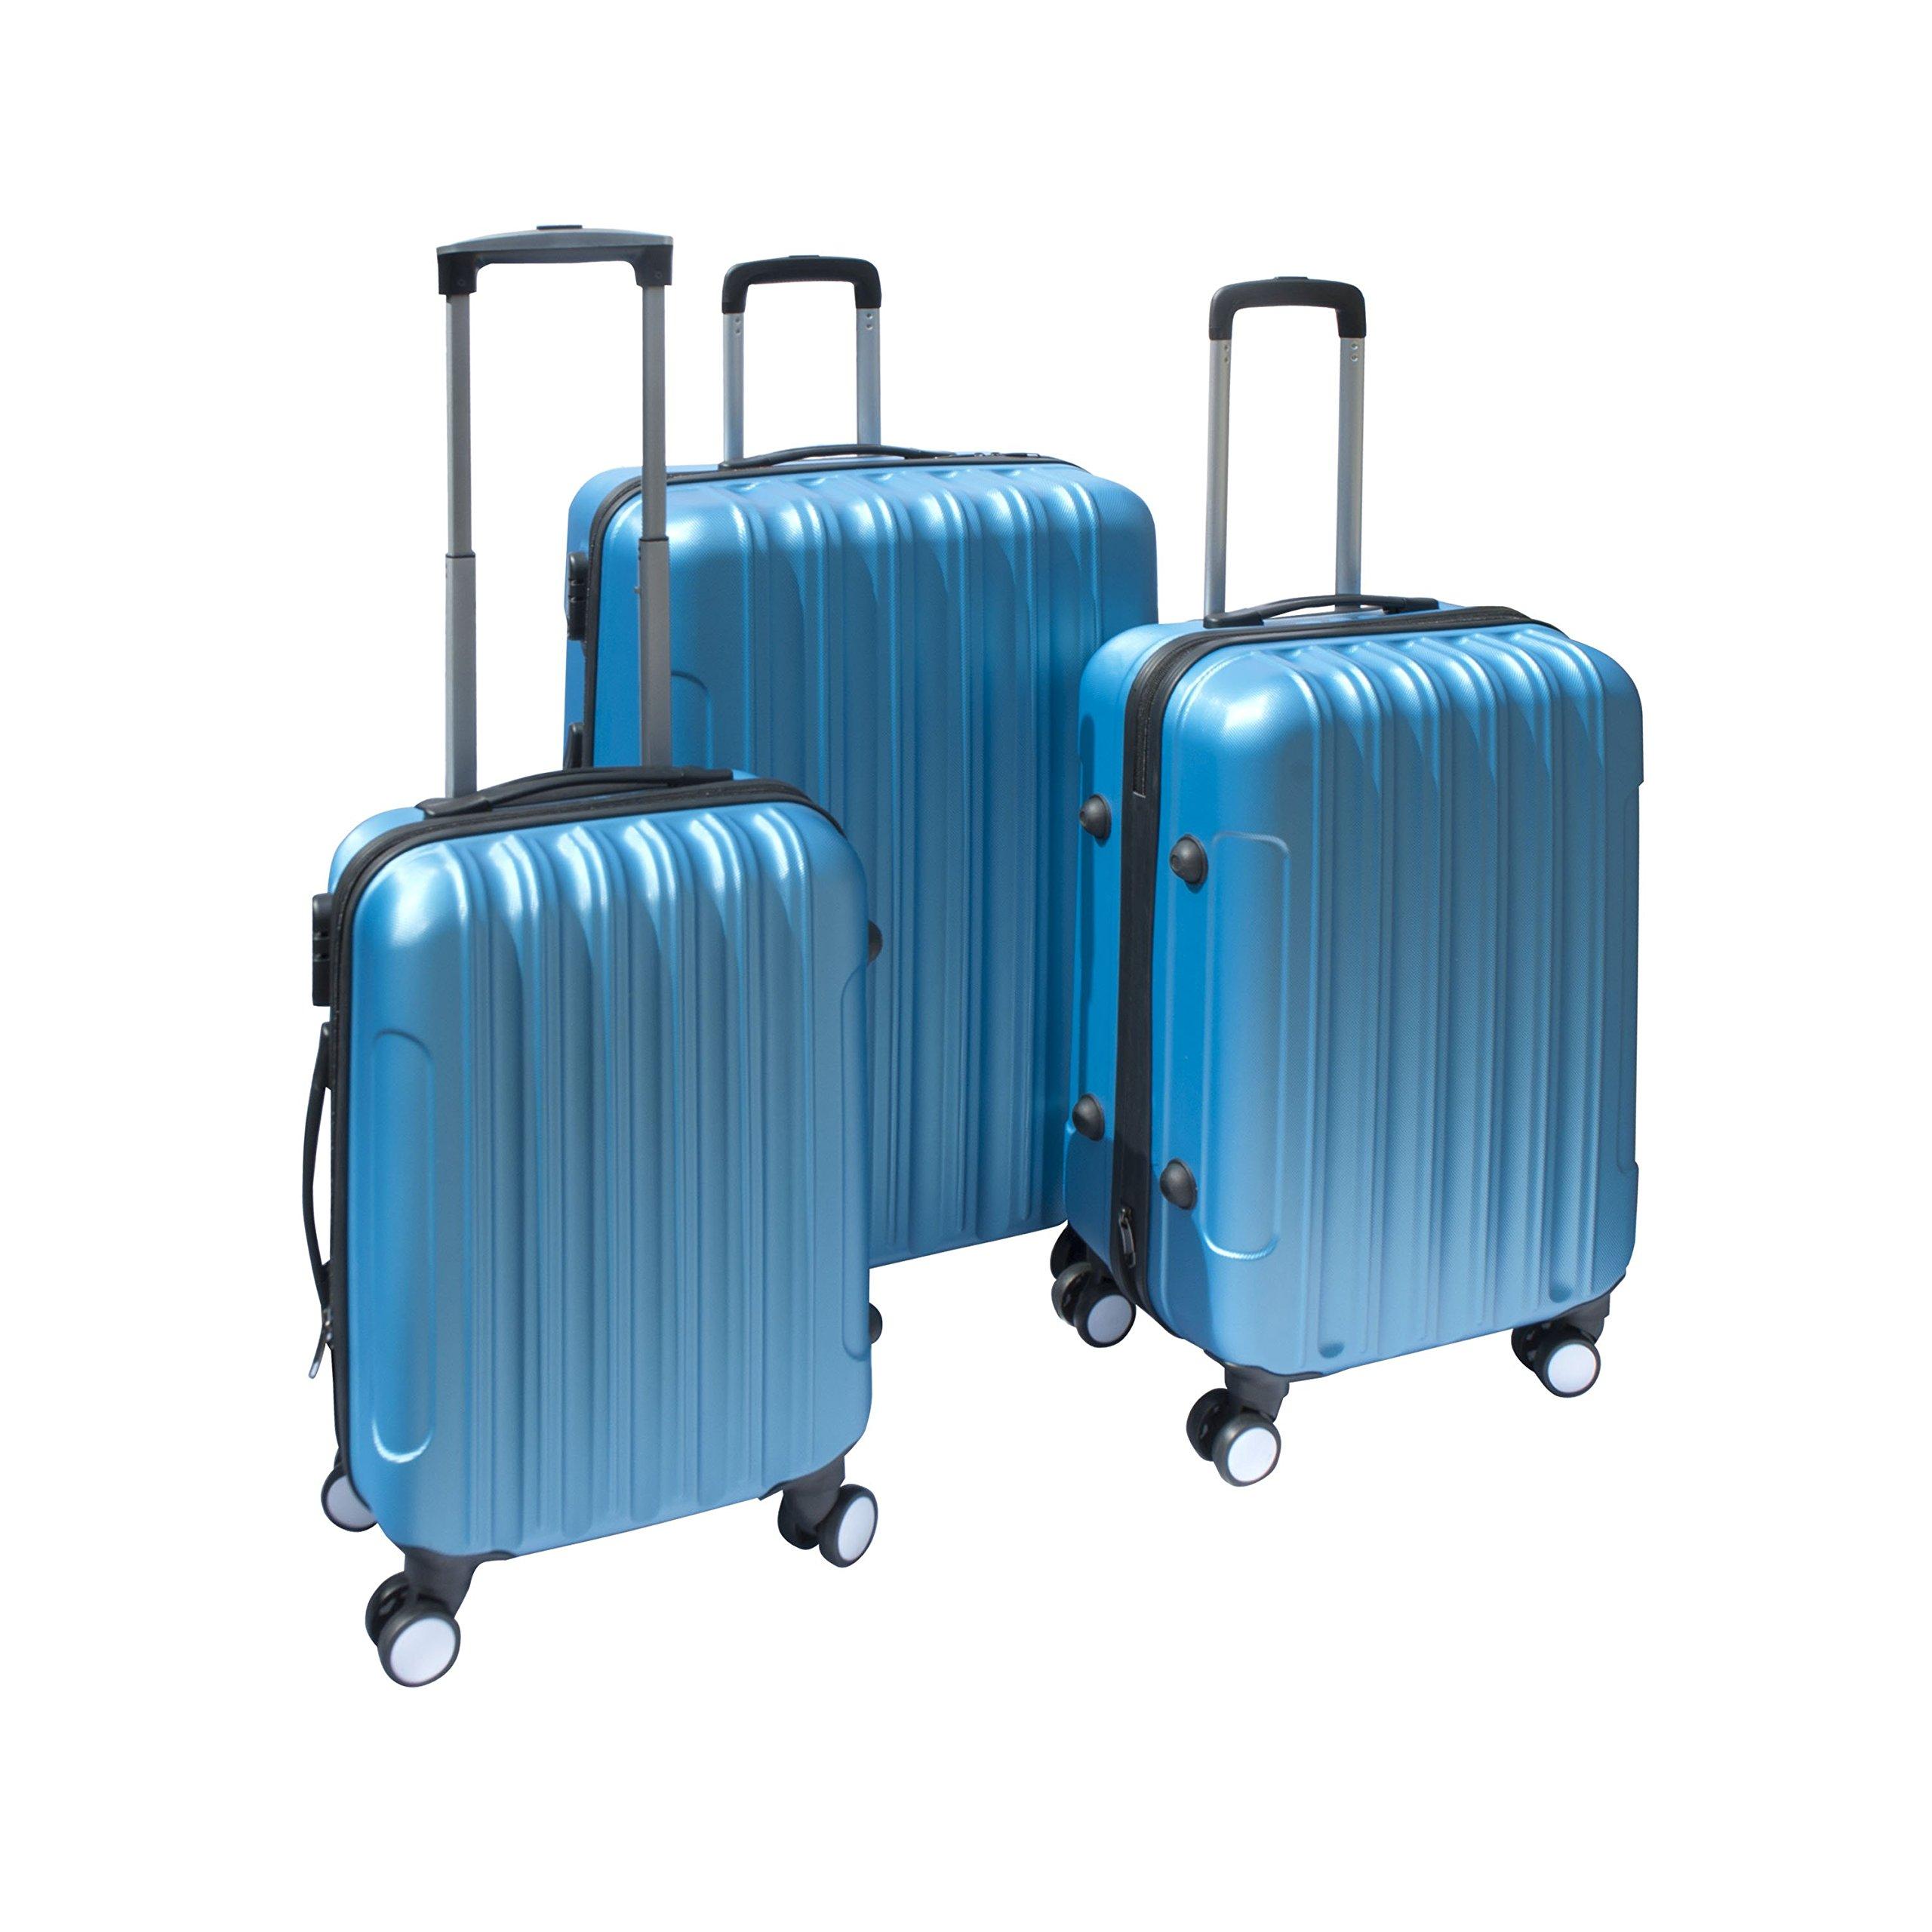 ALEKO 3 Piece Luggage Travel Bag Set ABS Suitcase With Lock, Blue Color